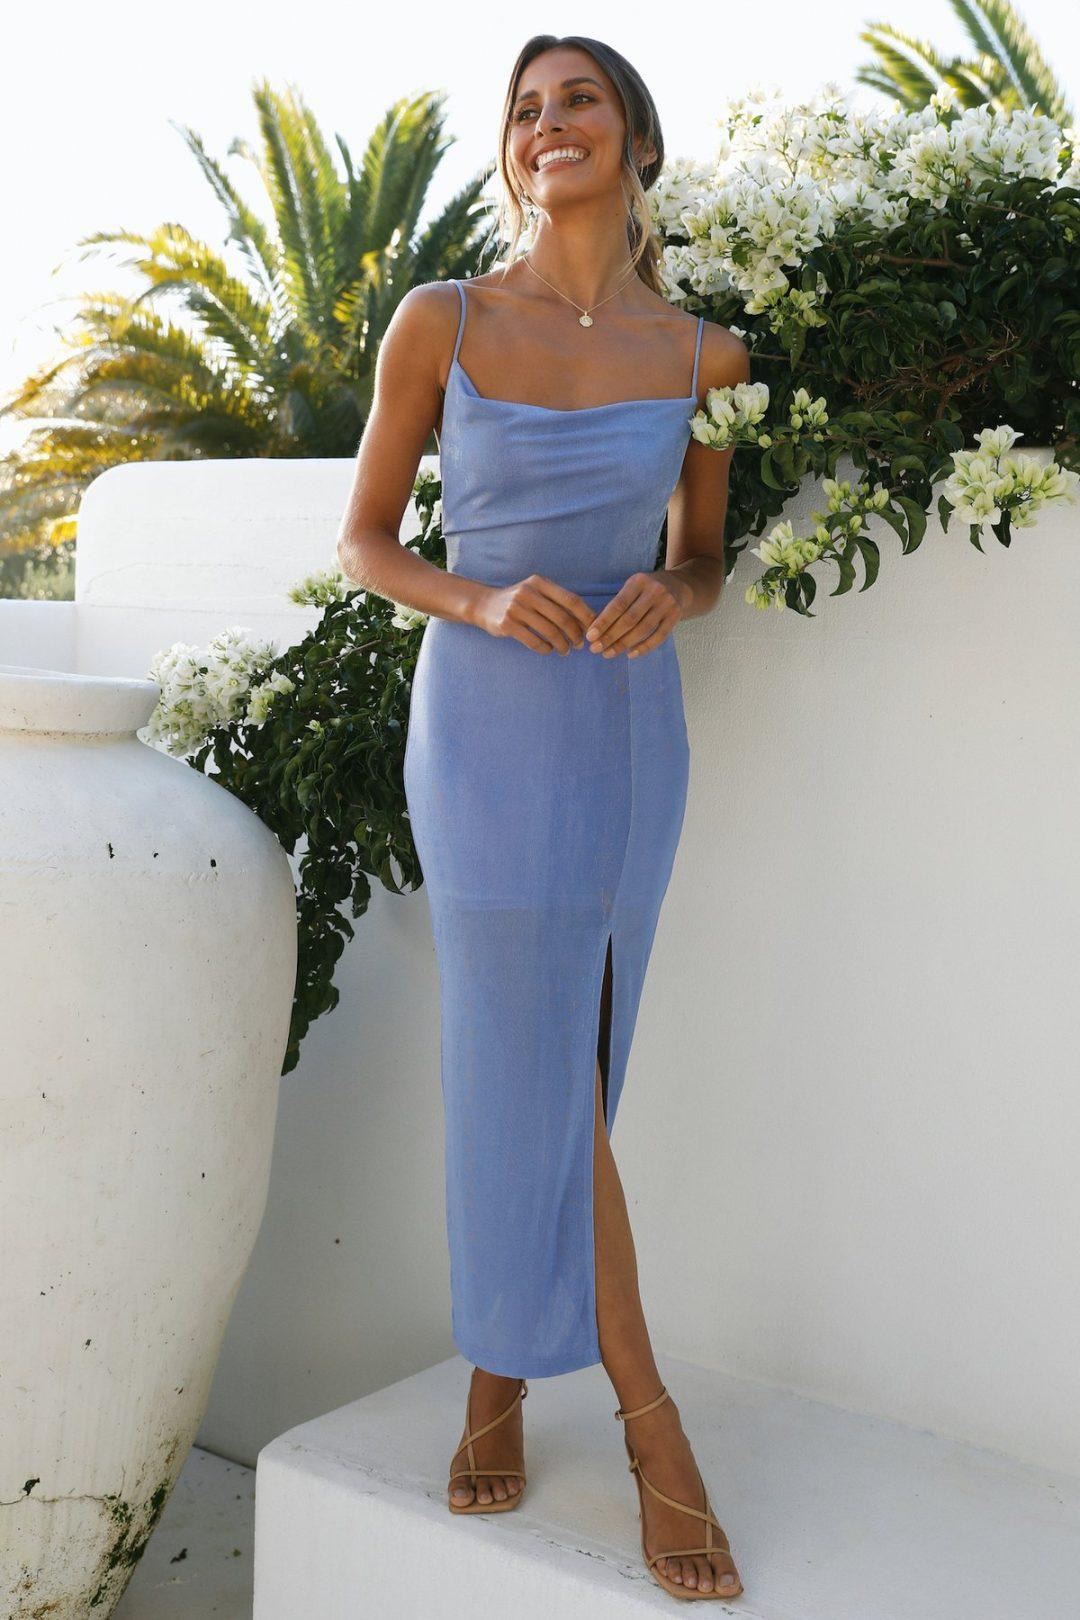 Simple blue maxi dress